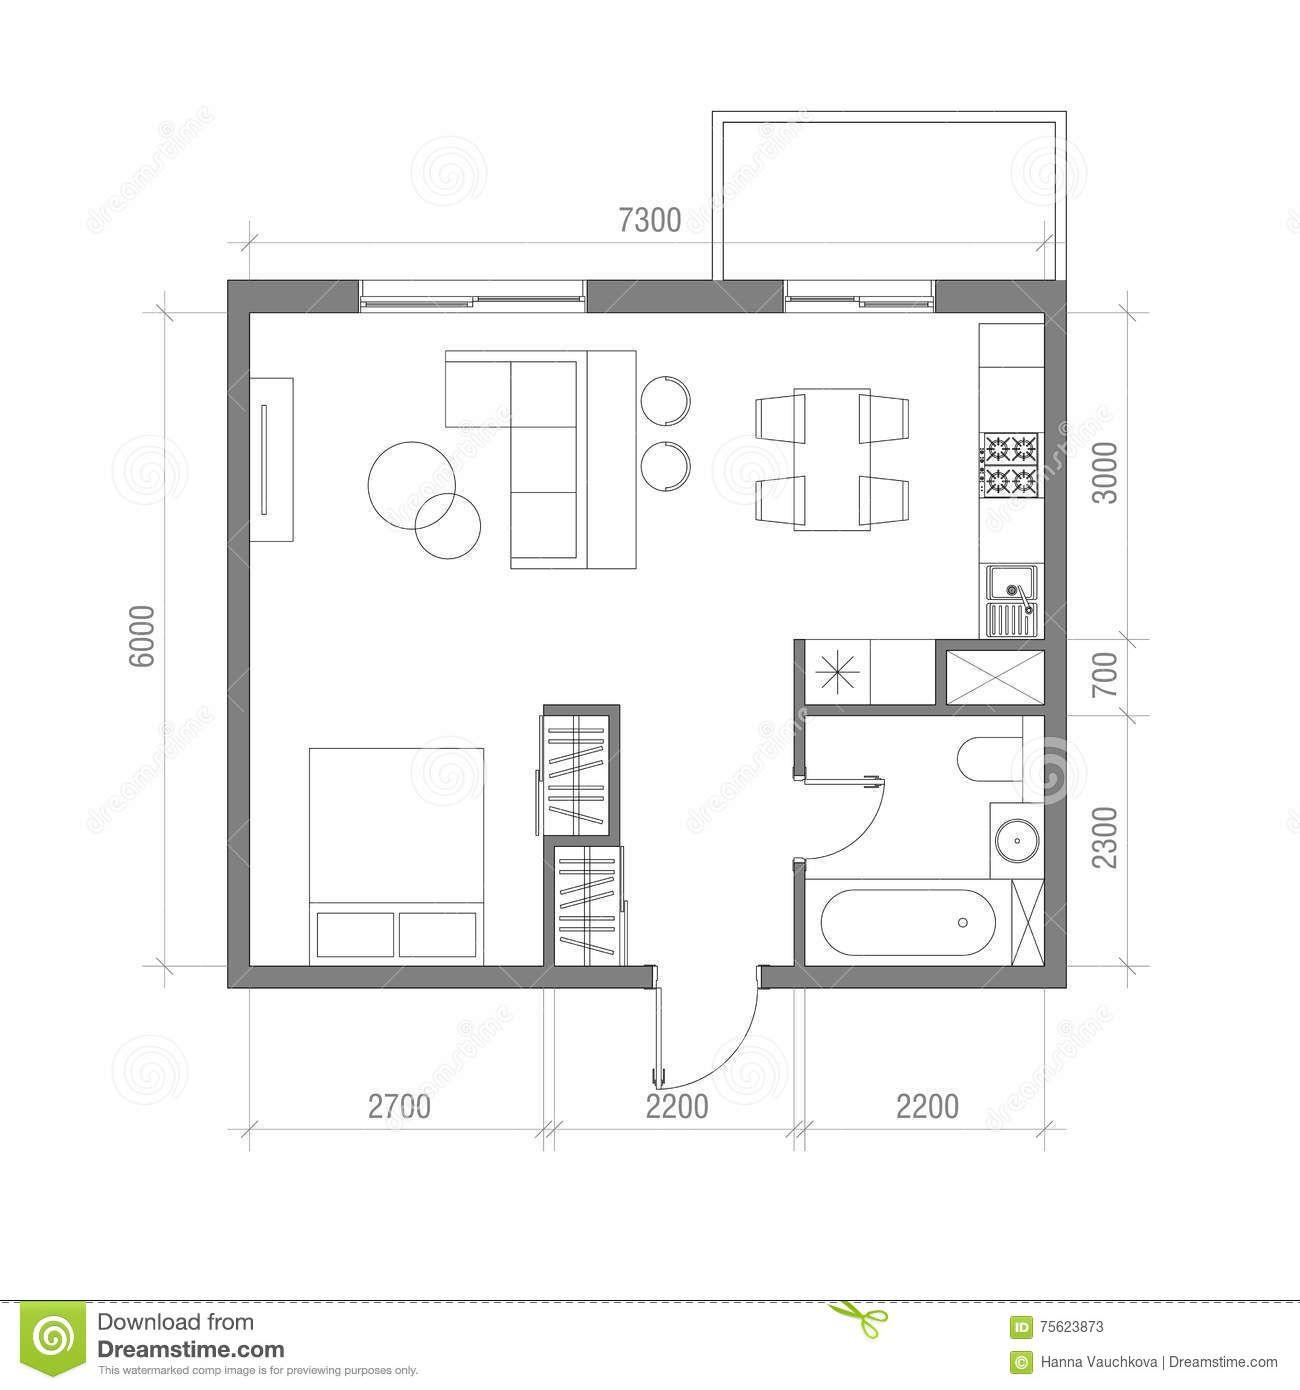 Architectural Floor Plan With Dimensions Studio Apartment Vector Illustratio Architectural Floor Plans Floor Plan With Dimensions Studio Apartment Floor Plans